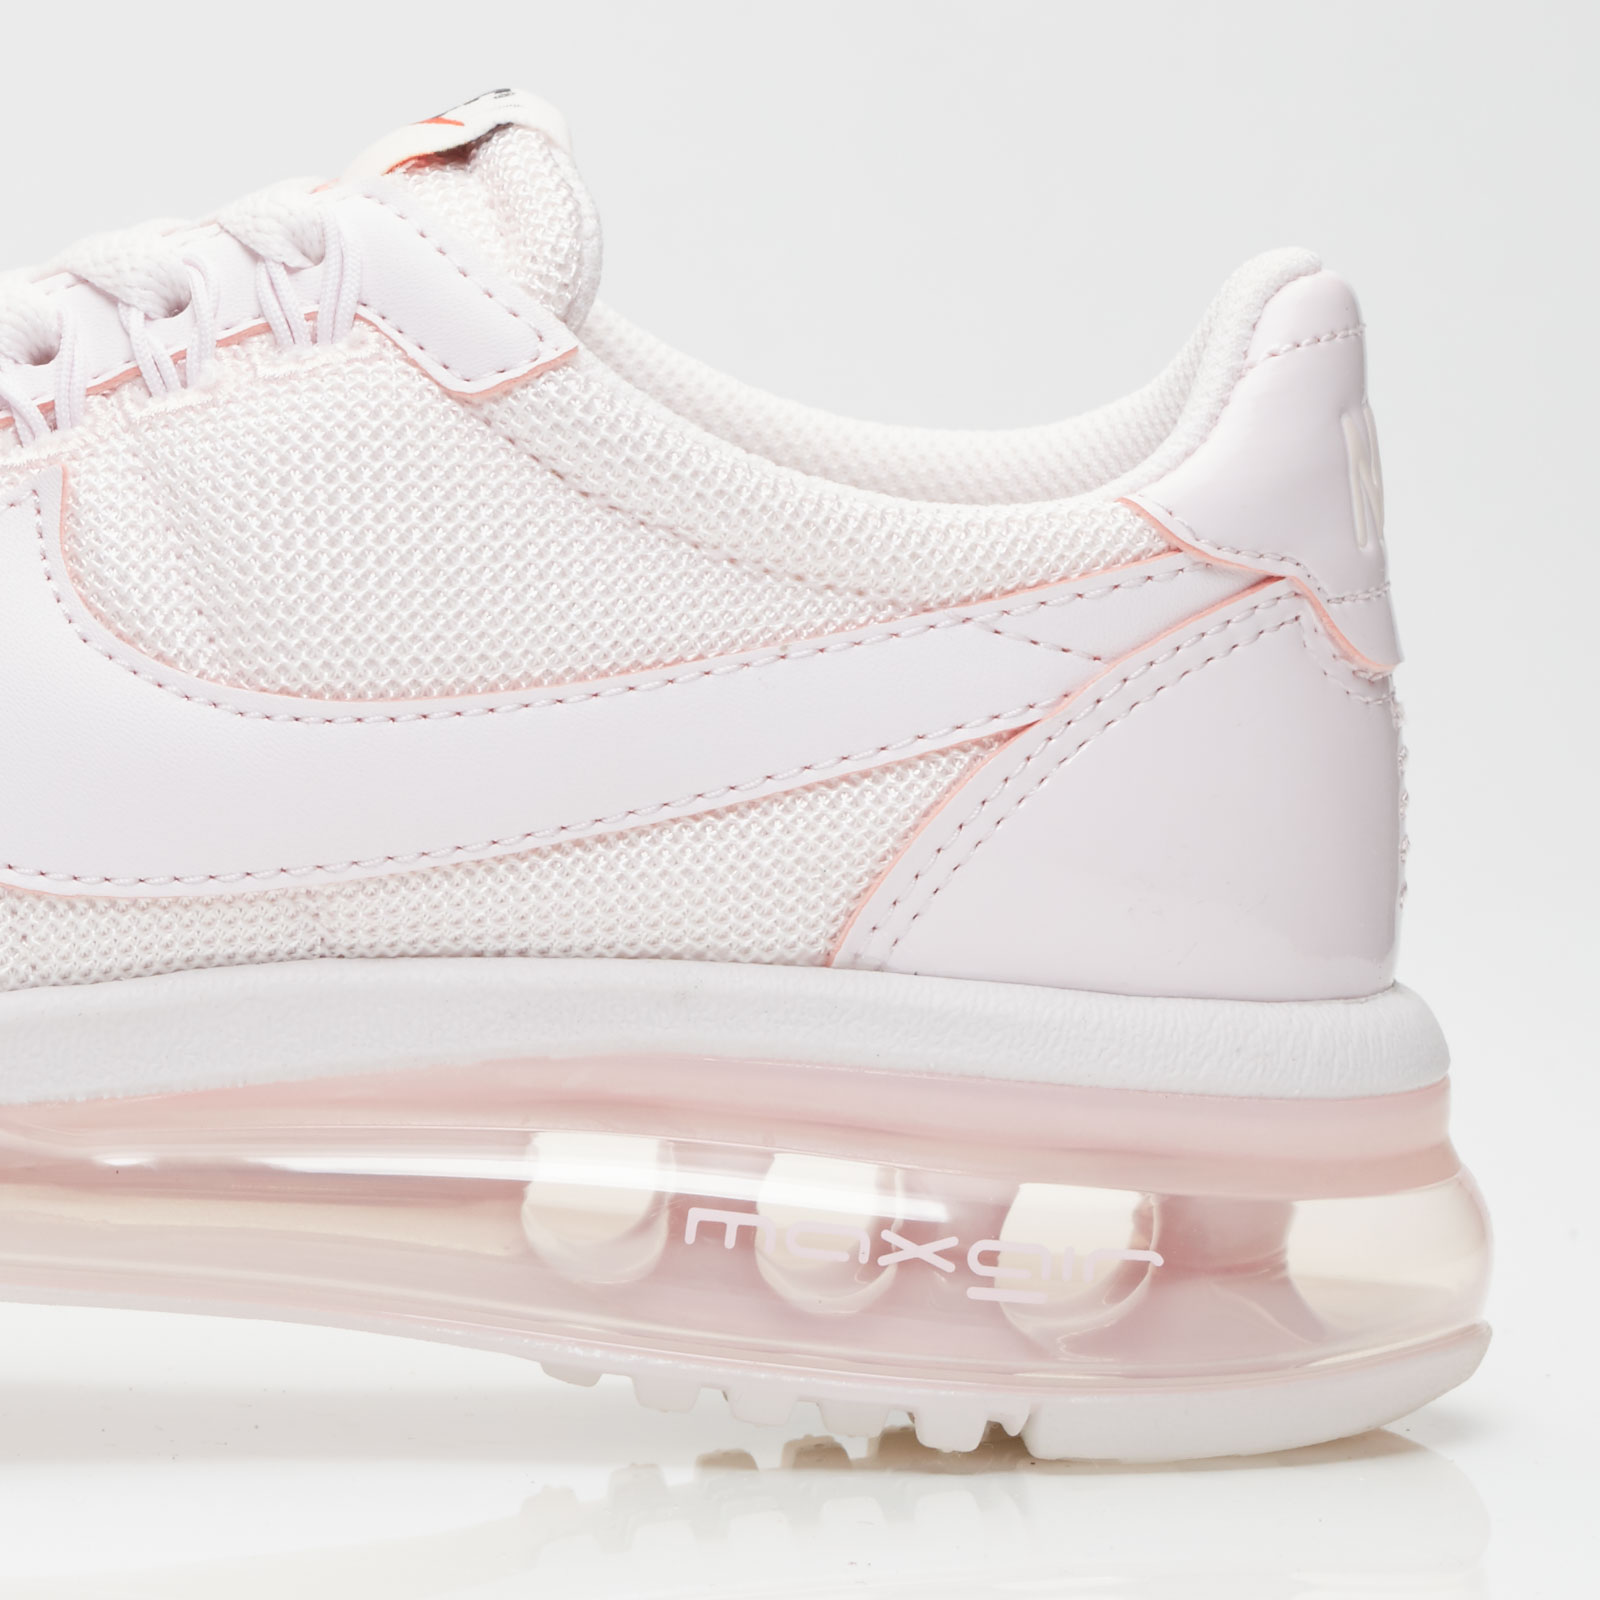 Nike Wmns Air Max Ld Zero Se 911180 600 Sneakersnstuff